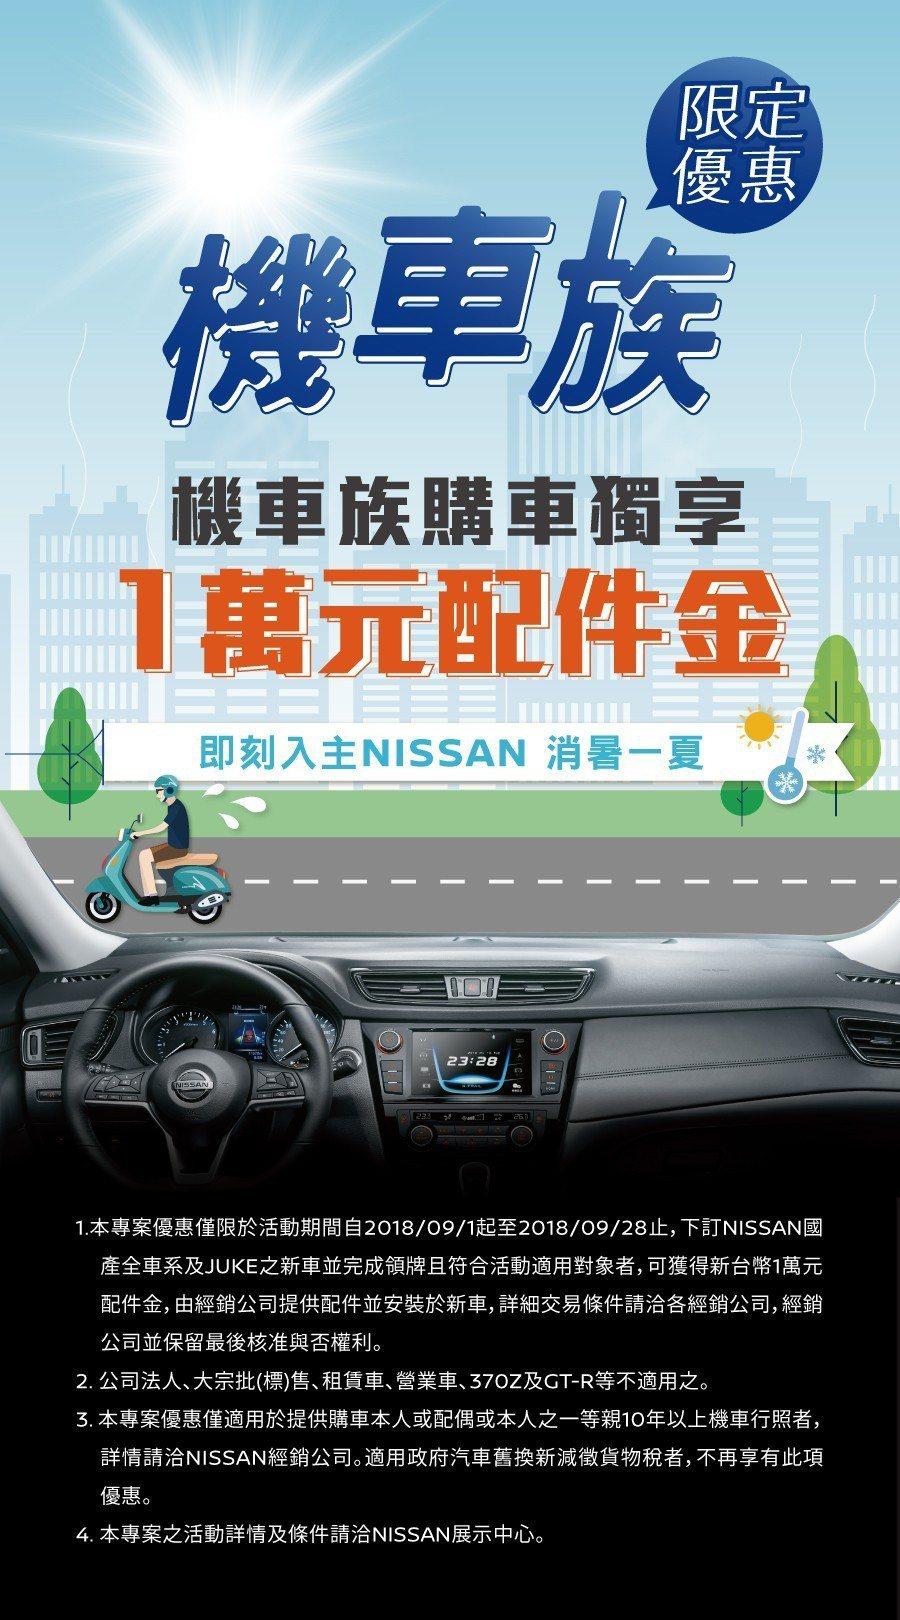 Nissan針對機車族推出購車優惠。 圖/裕隆日產提供